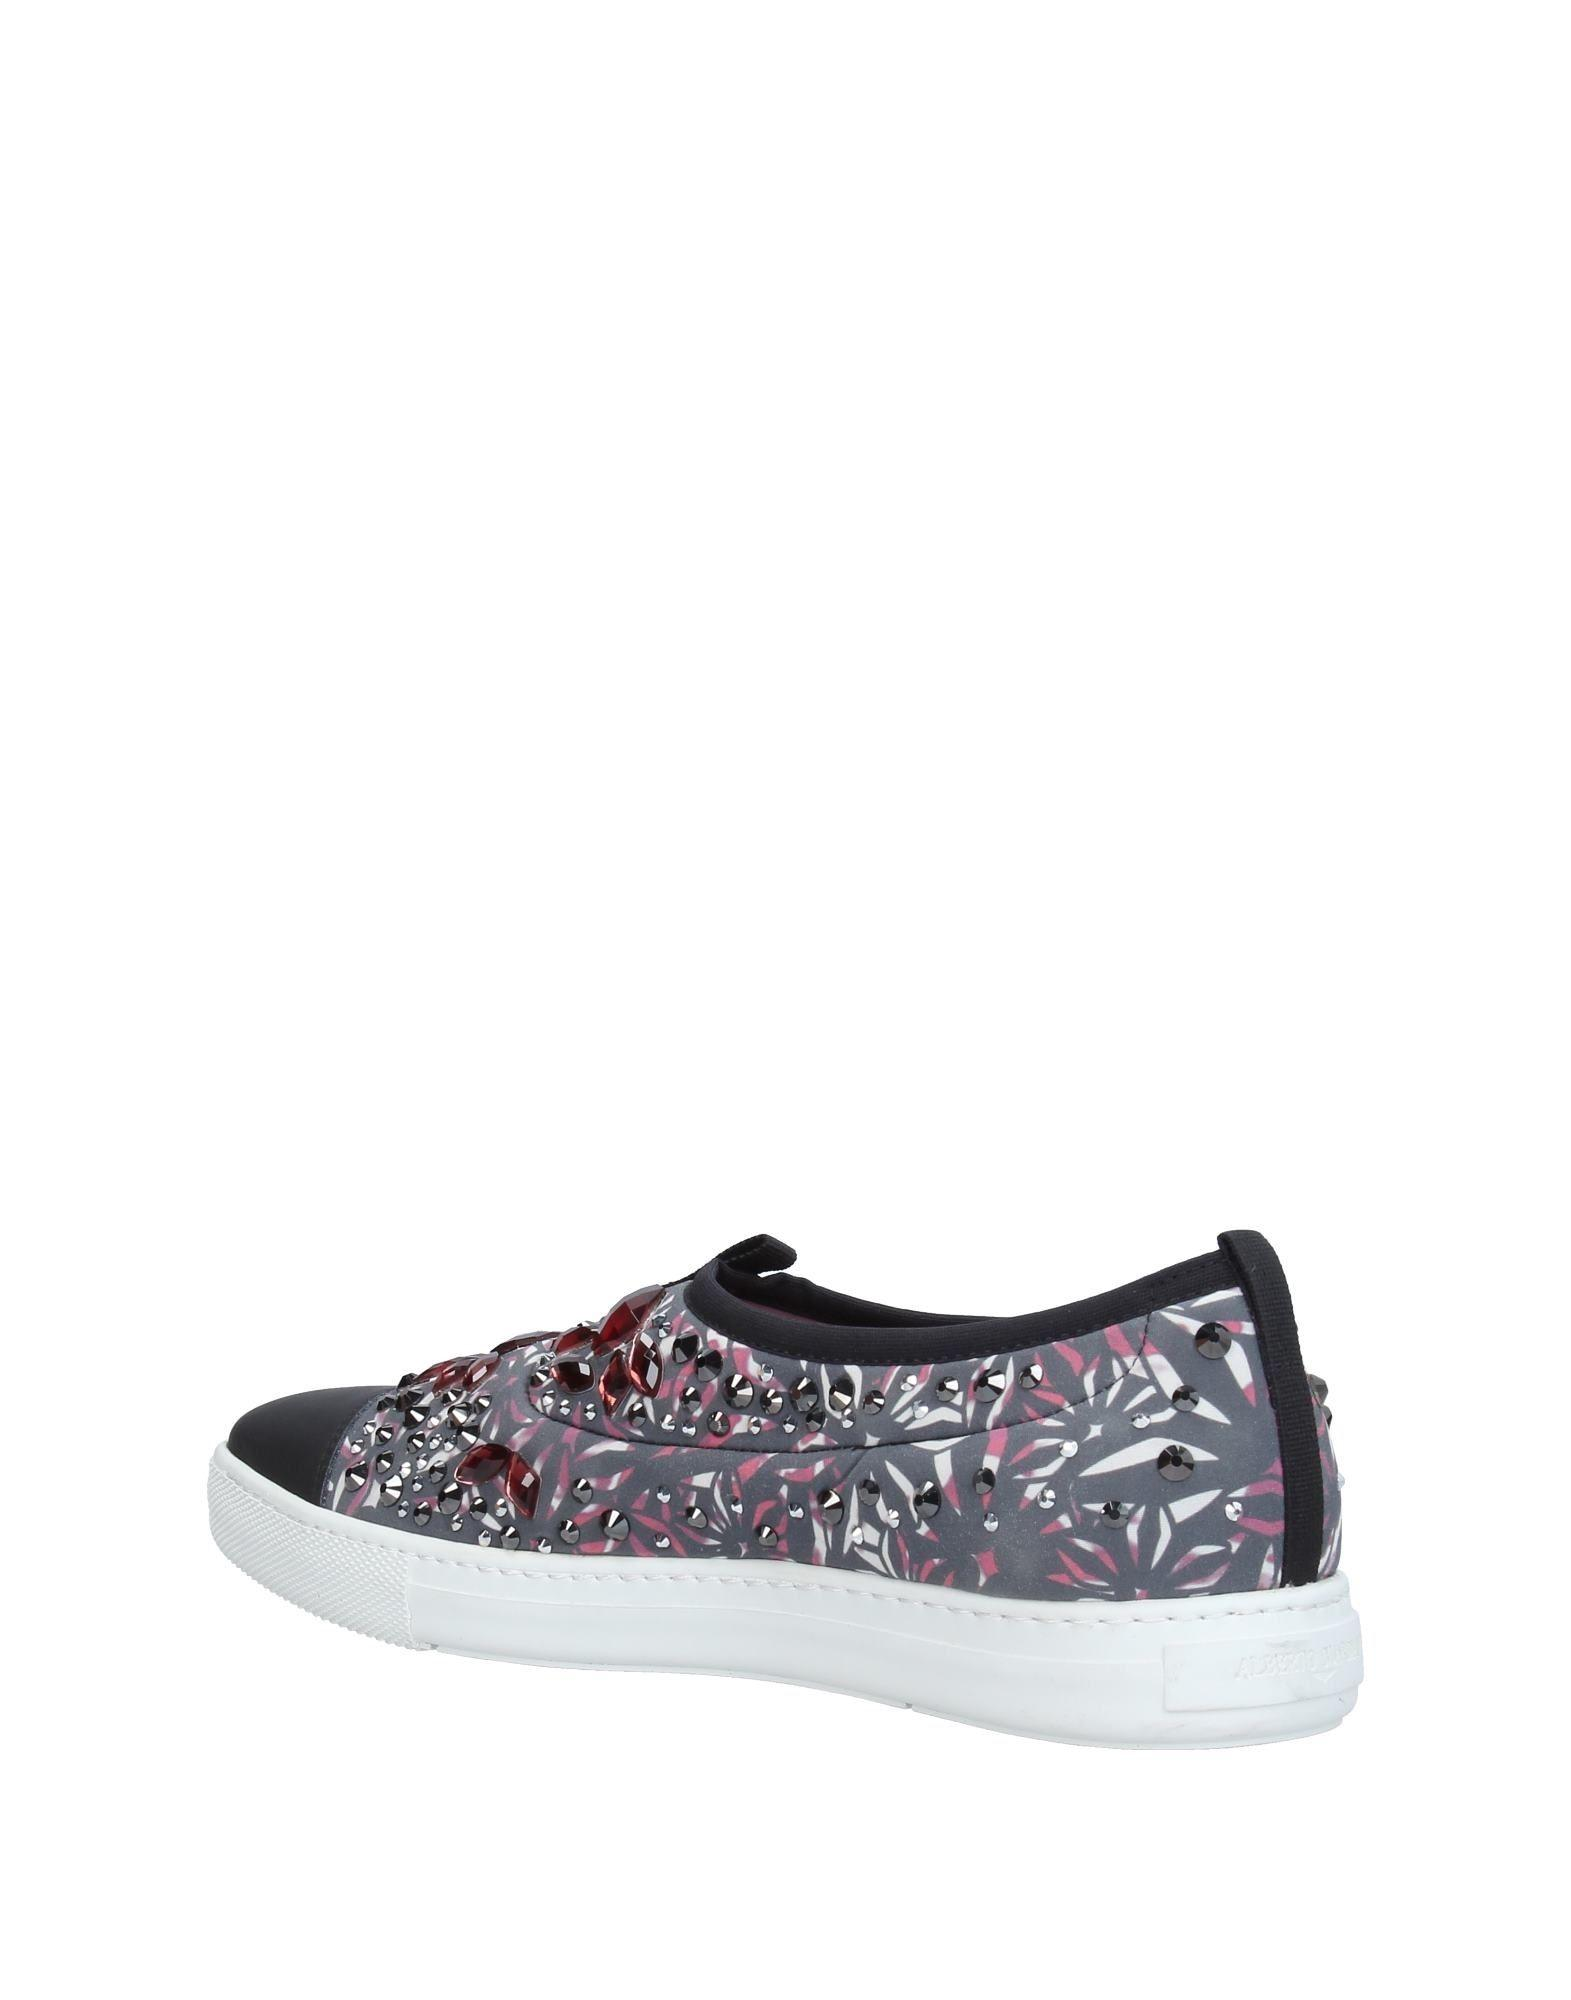 Alberto Guardiani Neoprene Low-tops & Sneakers in Grey (Grey)